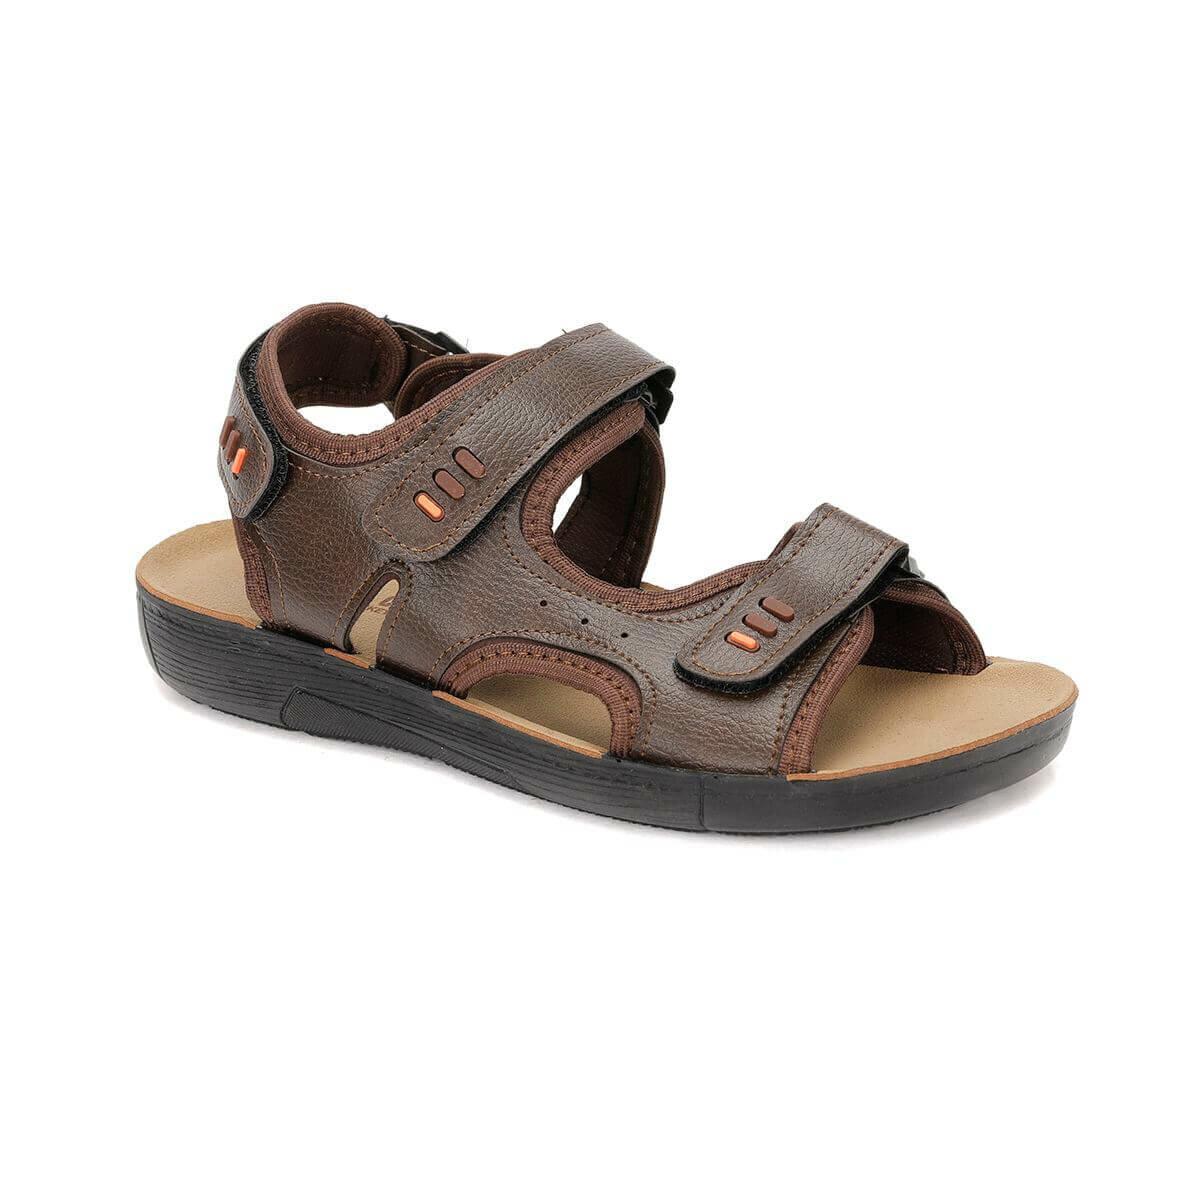 FLO EF-3 Brown Male Sandals Panama Club